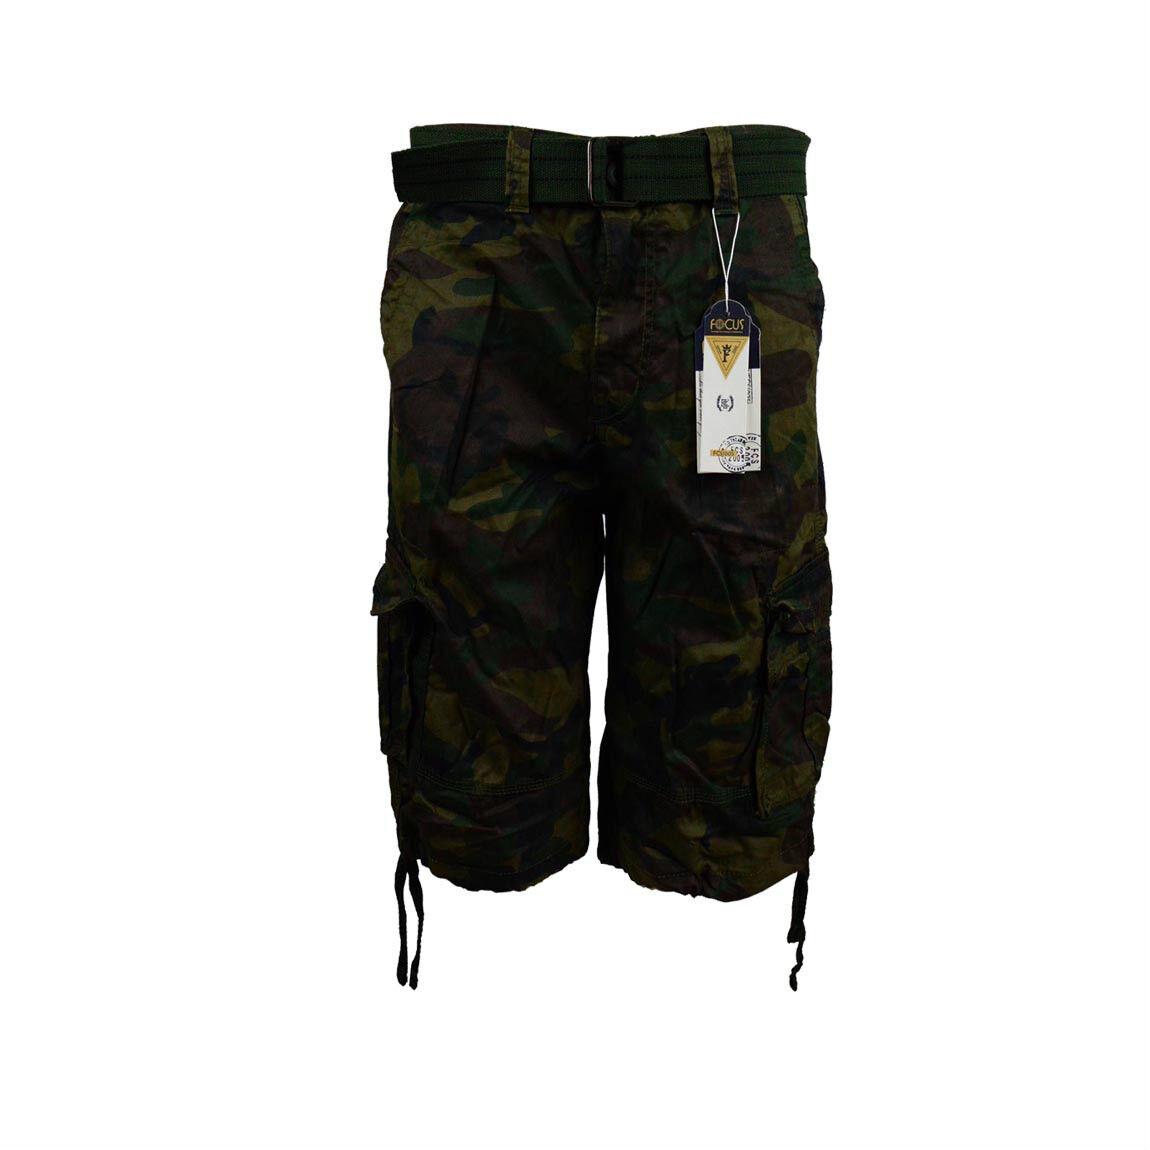 Men's Army Shorts Camouflage Belt Focus 32 34 36 38 40 42 44 Cargo Shorts Camo